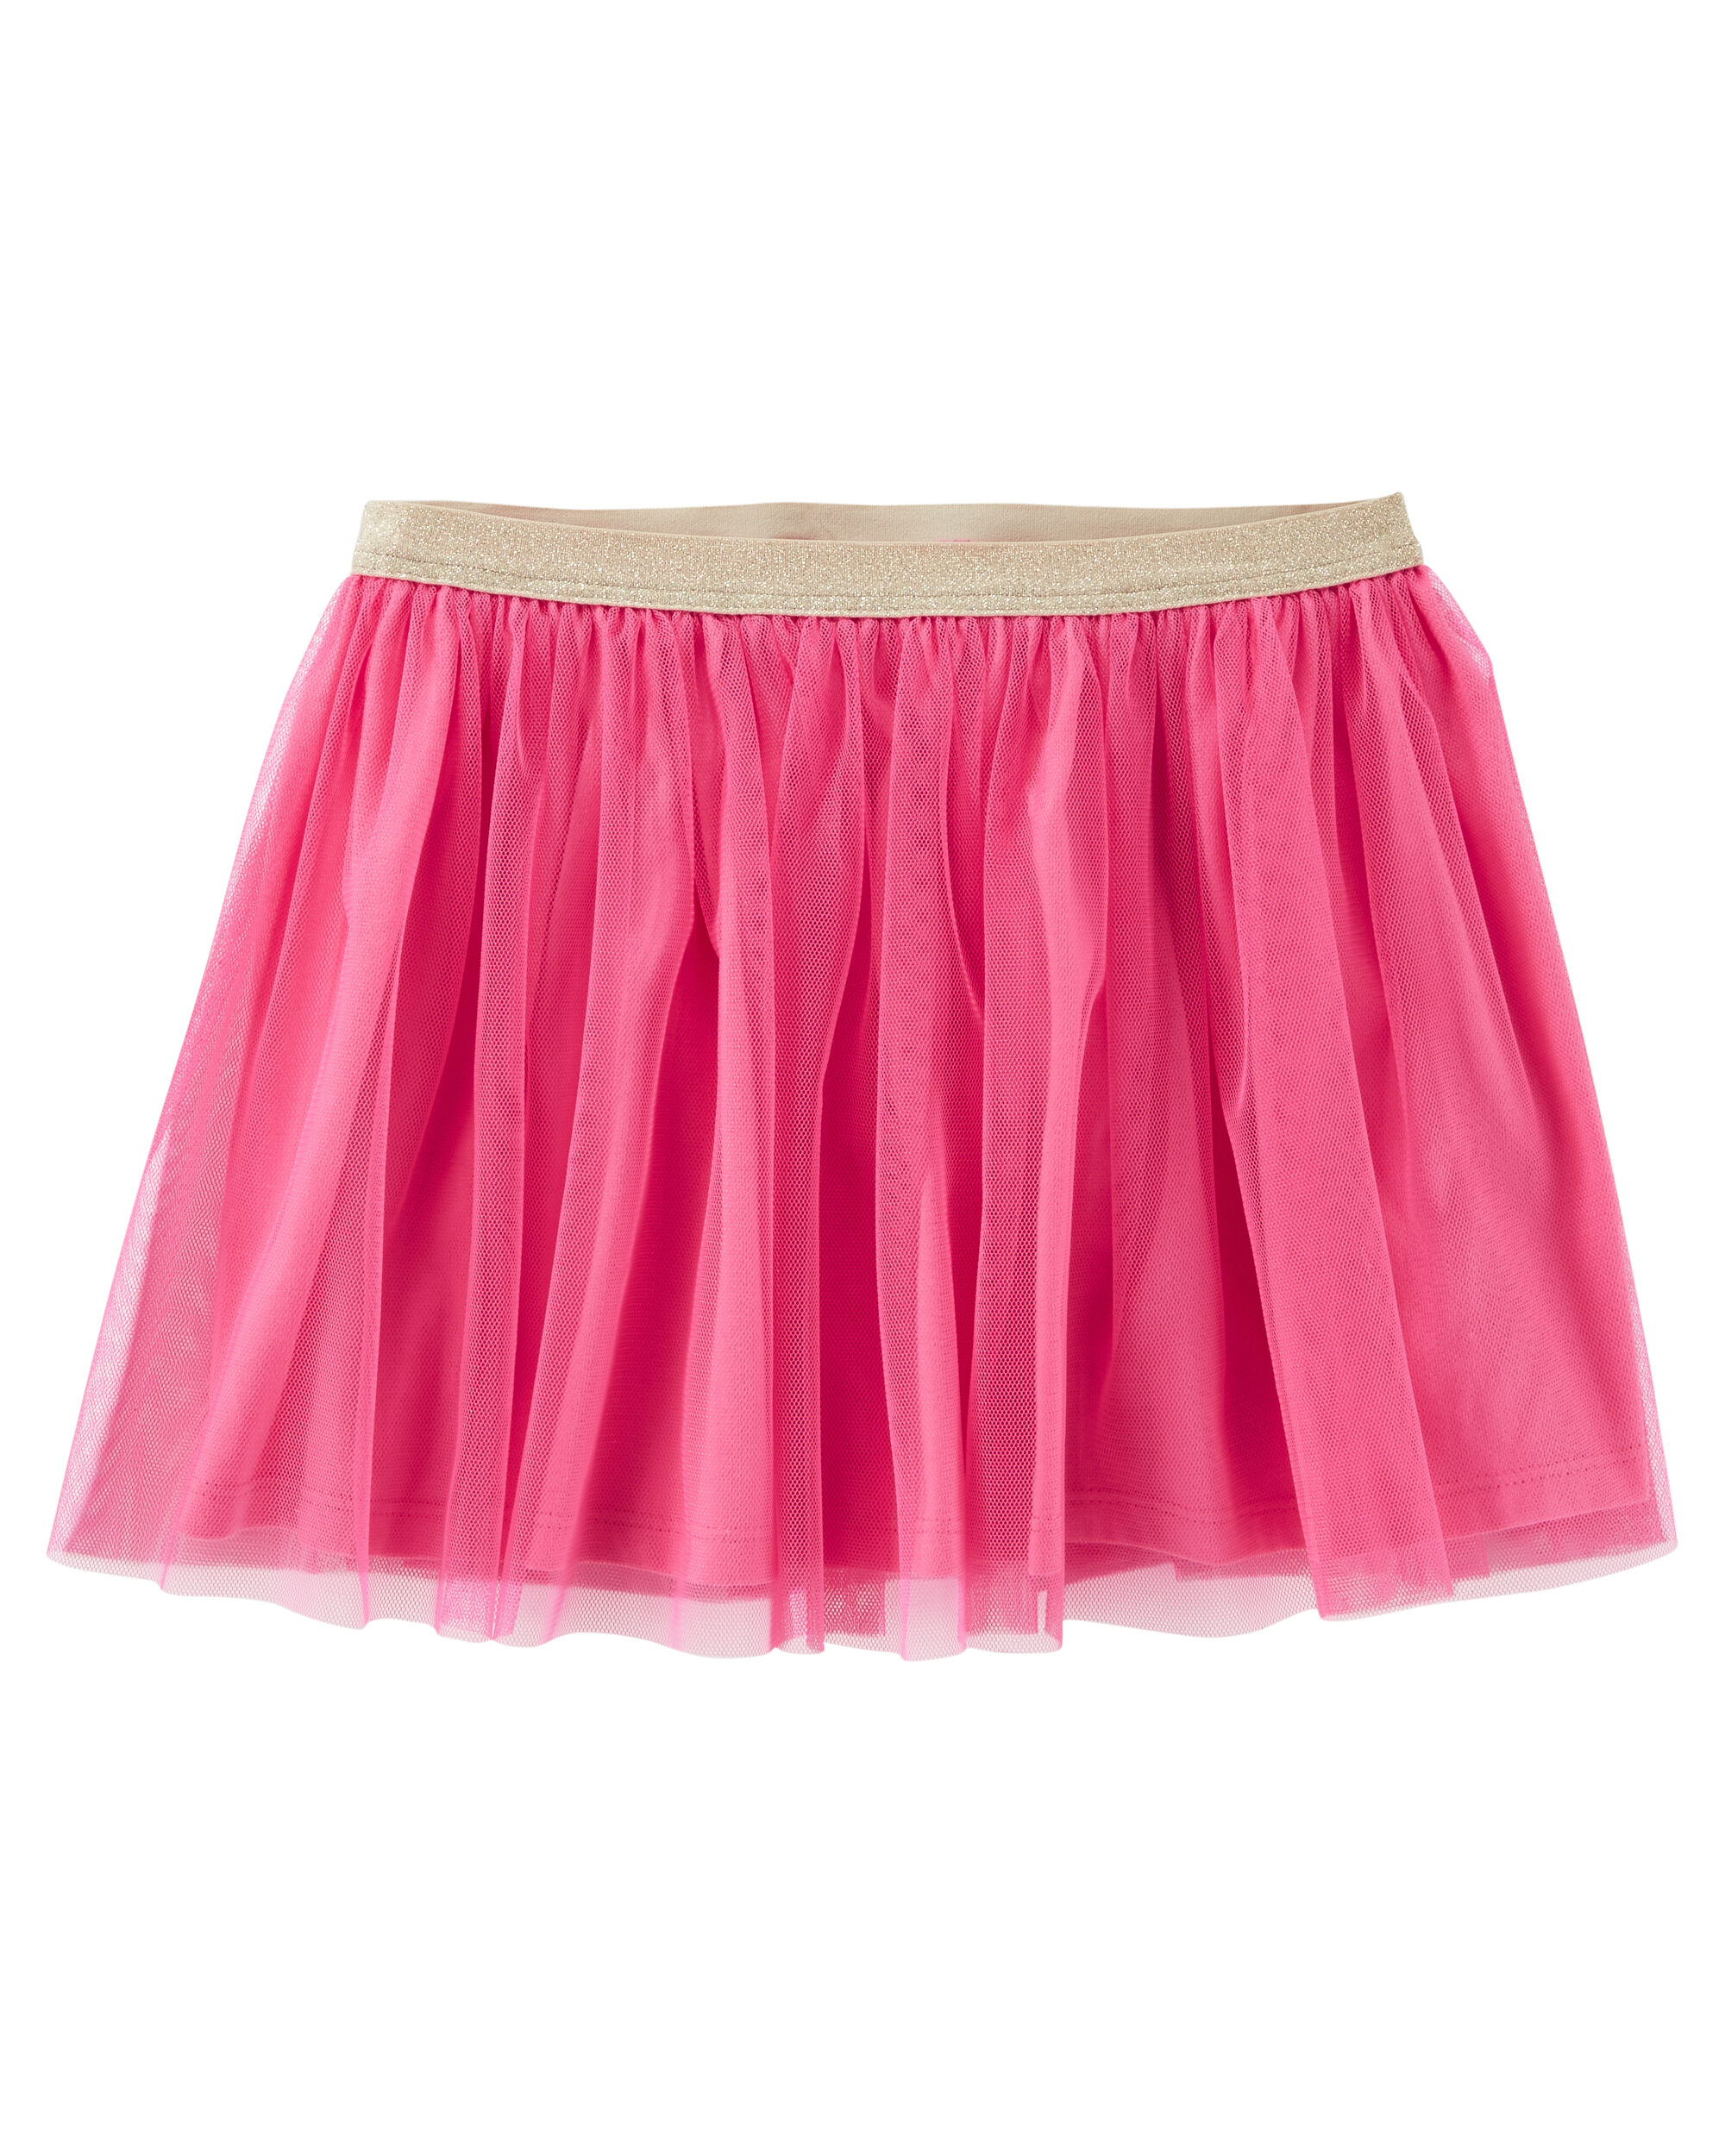 2-Piece Sparkle Tulle Skirt